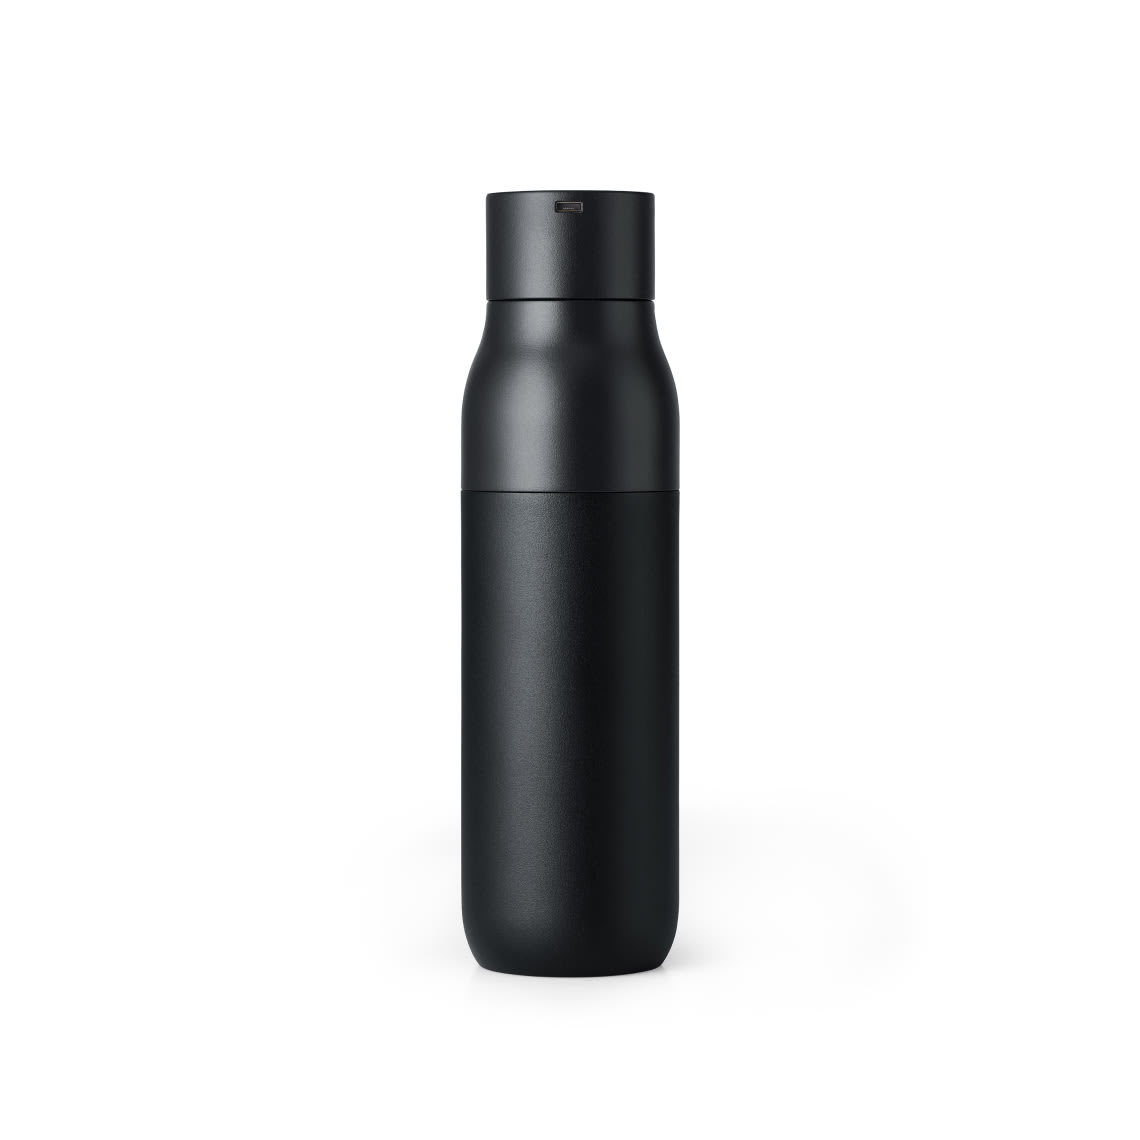 LARQ Bottle PureVis - Obsidian Black